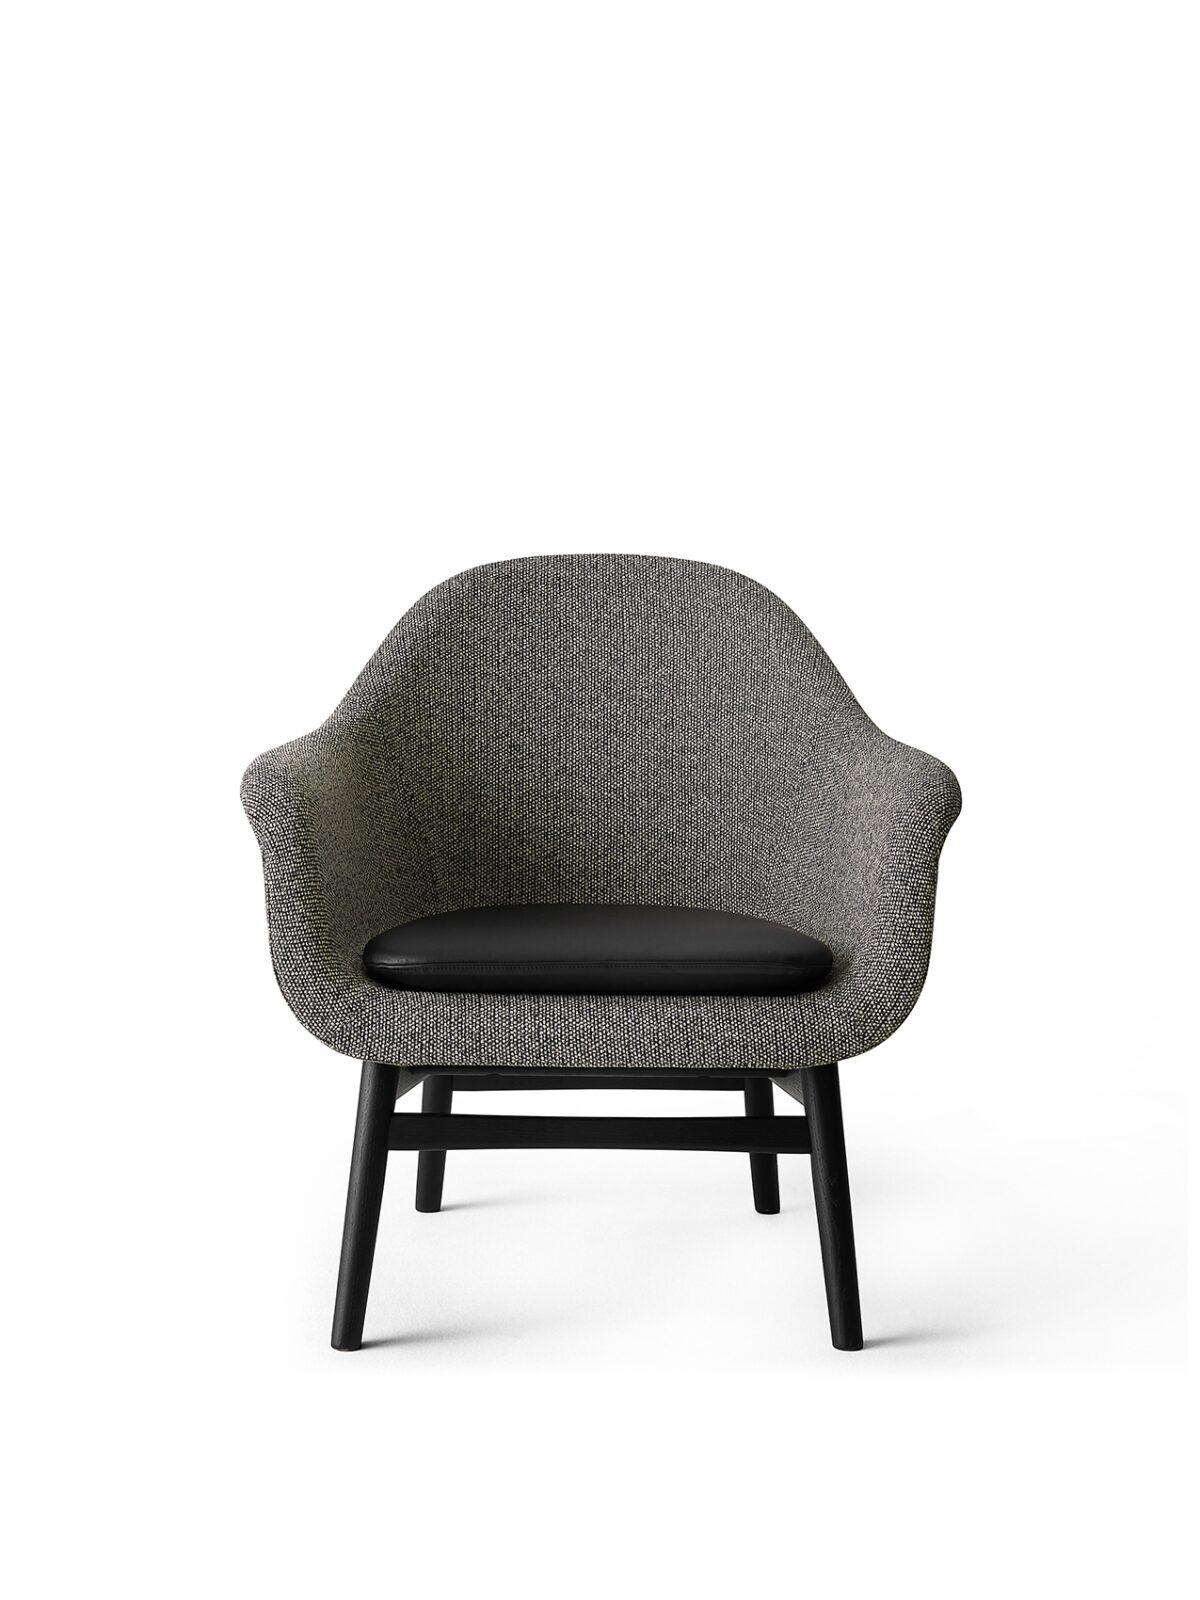 9255569 Harbour Lounge Low back Black oak Savanna 152 Shade pitch black cushion front 1